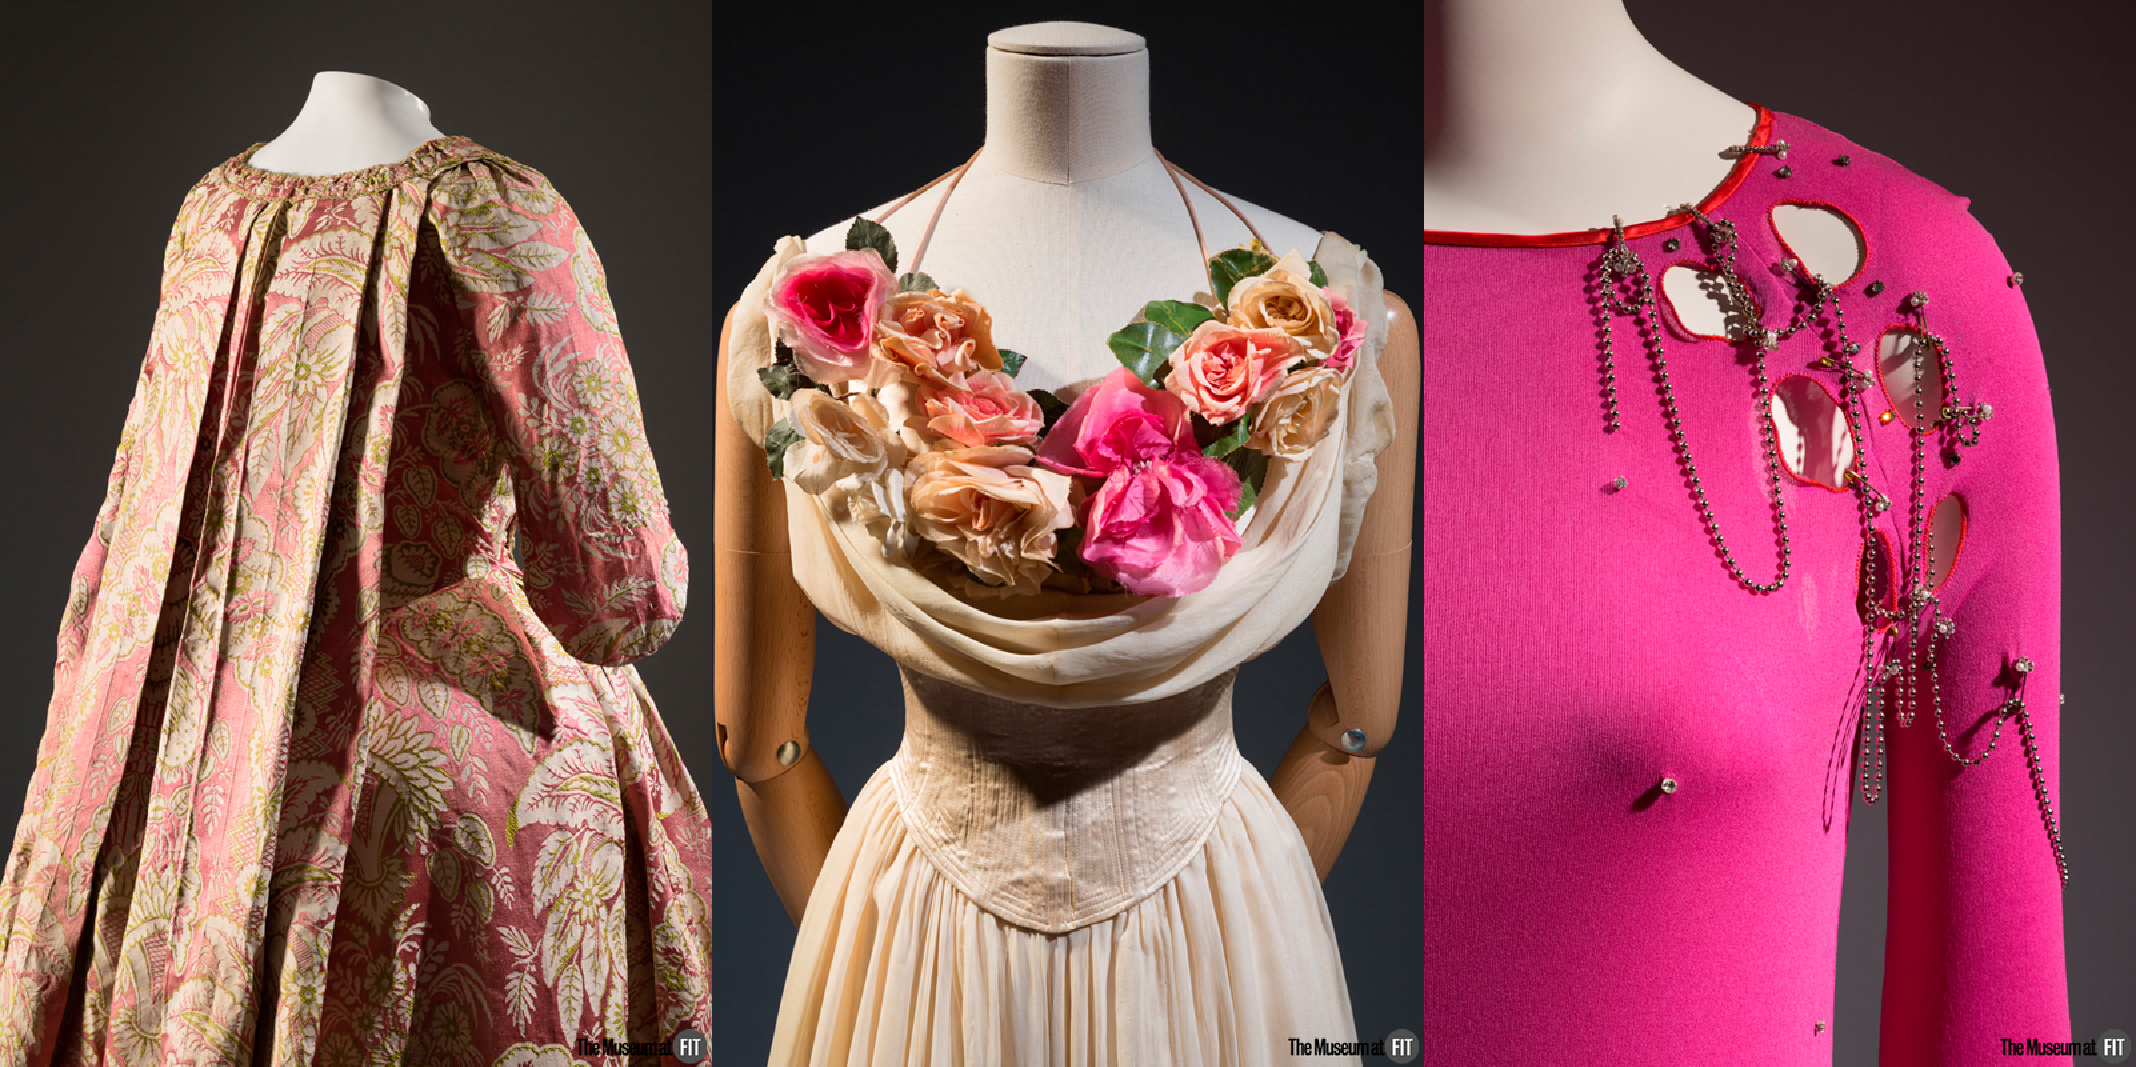 Dress - 18th century, museum purchase. Charles James dress - 1937, gift of Mrs. John Hammond.  Zandra Rhodes ensemble - 1978, England, museum purchase.